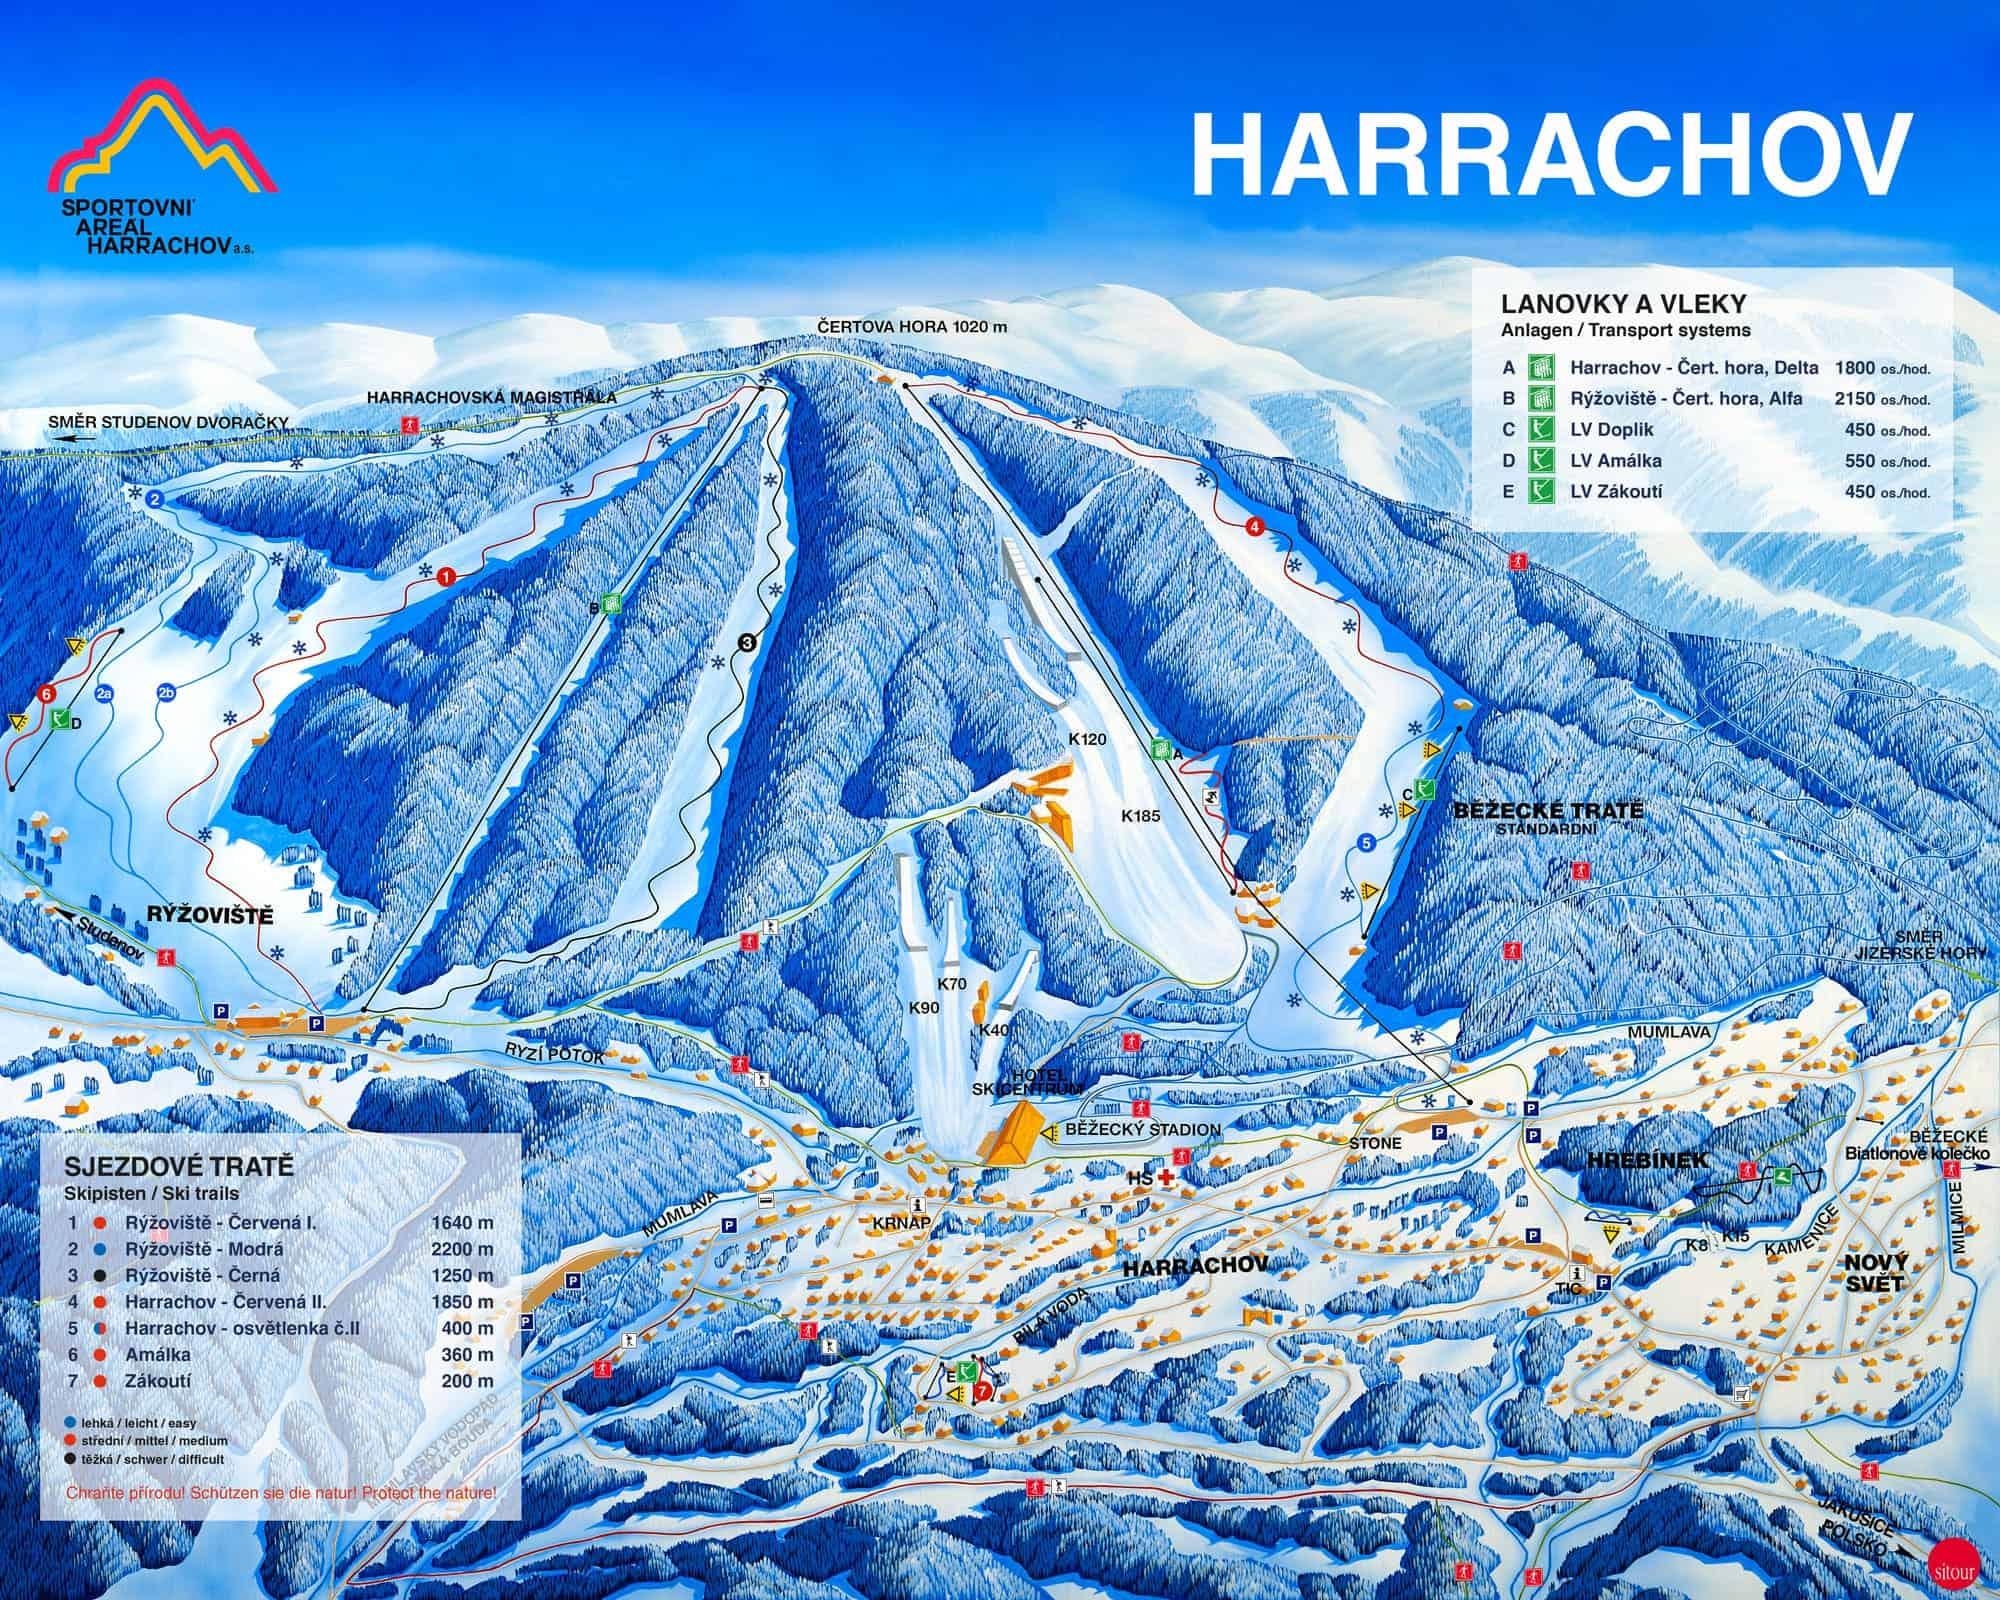 Harrachov Ski Trail Map 2019